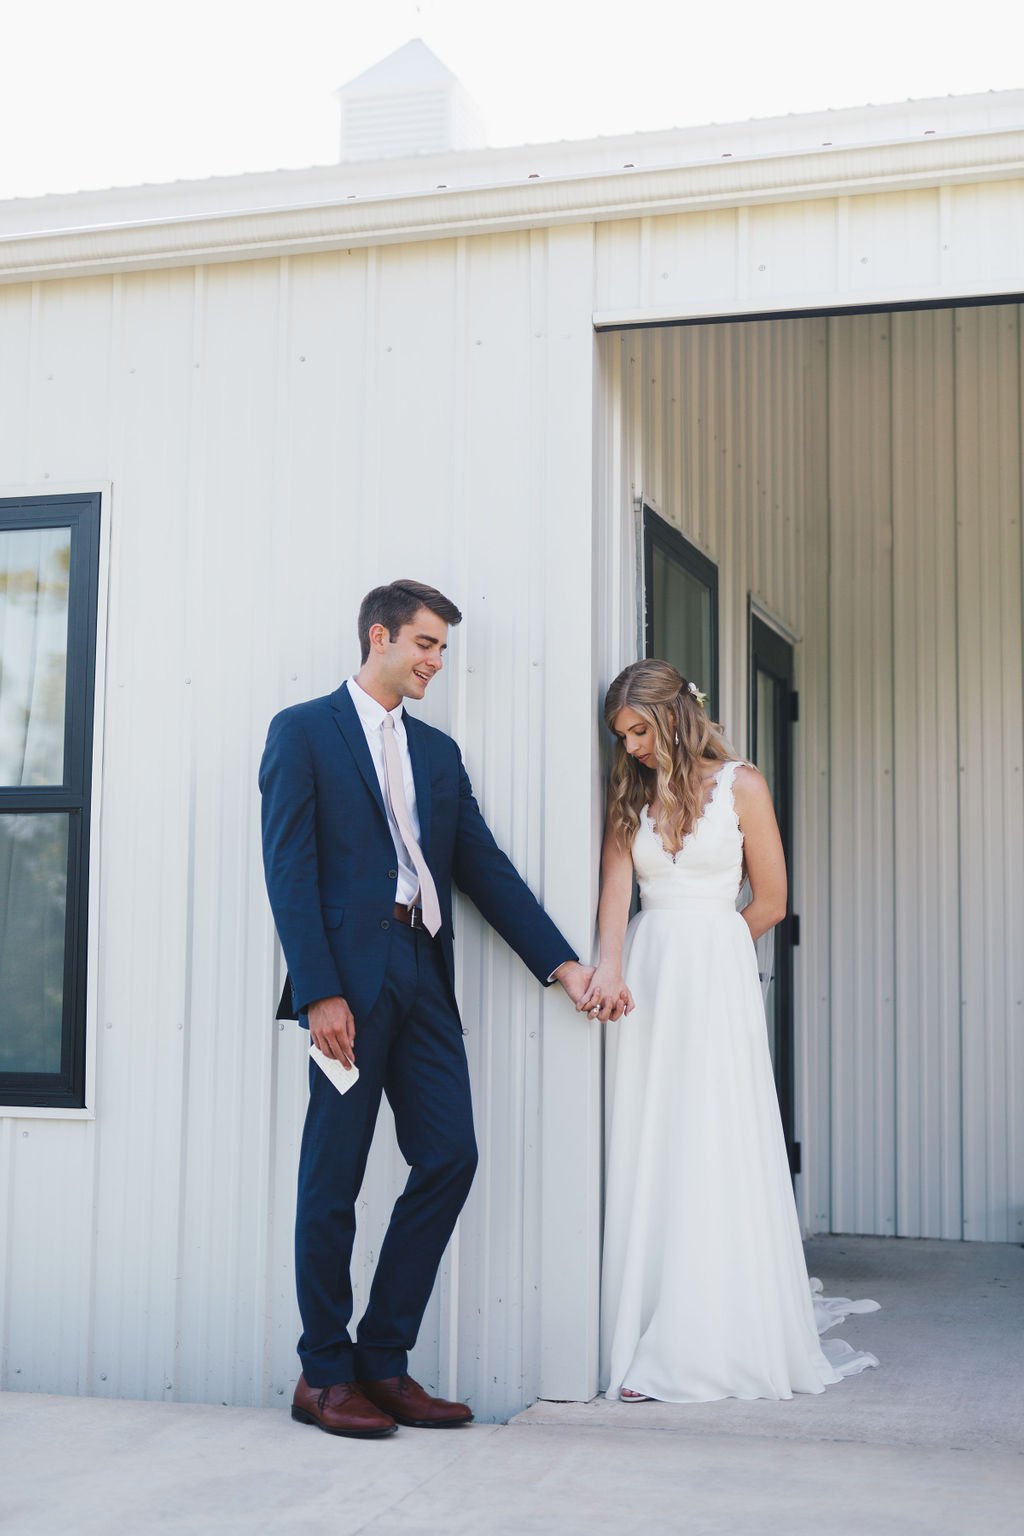 Bixby White Barn Tulsa Wedding 41.jpg